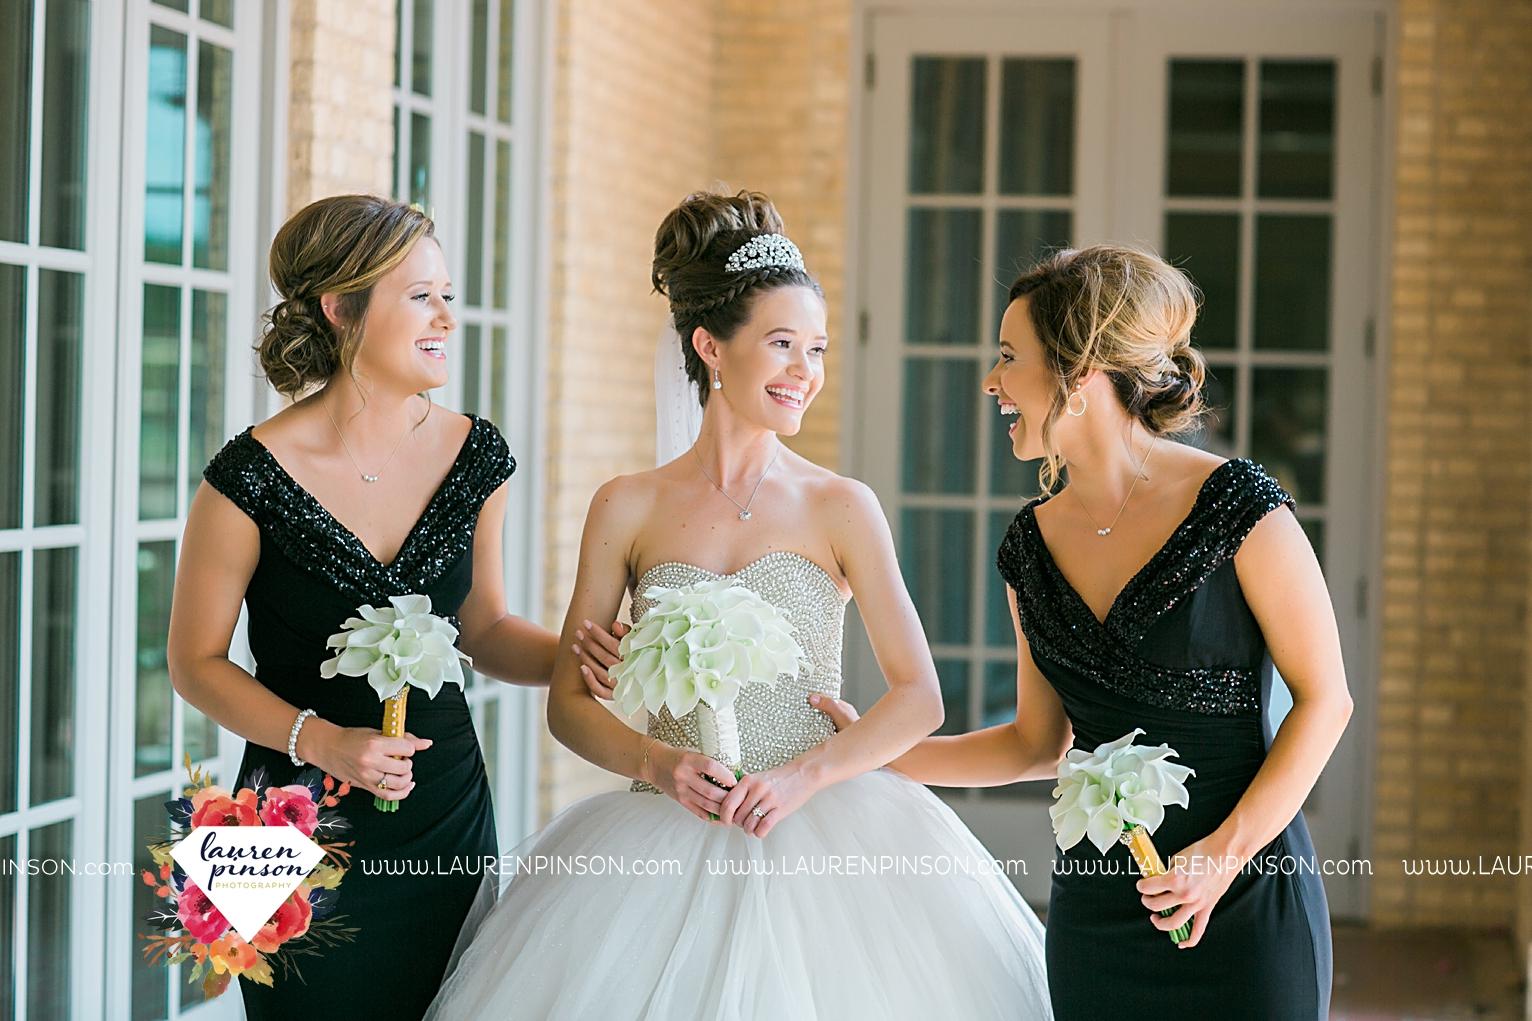 wichita-falls-texas-wedding-photographer-the-forum-by-the-kemp-mayfield-events-ulta-gold-glitter_2841.jpg